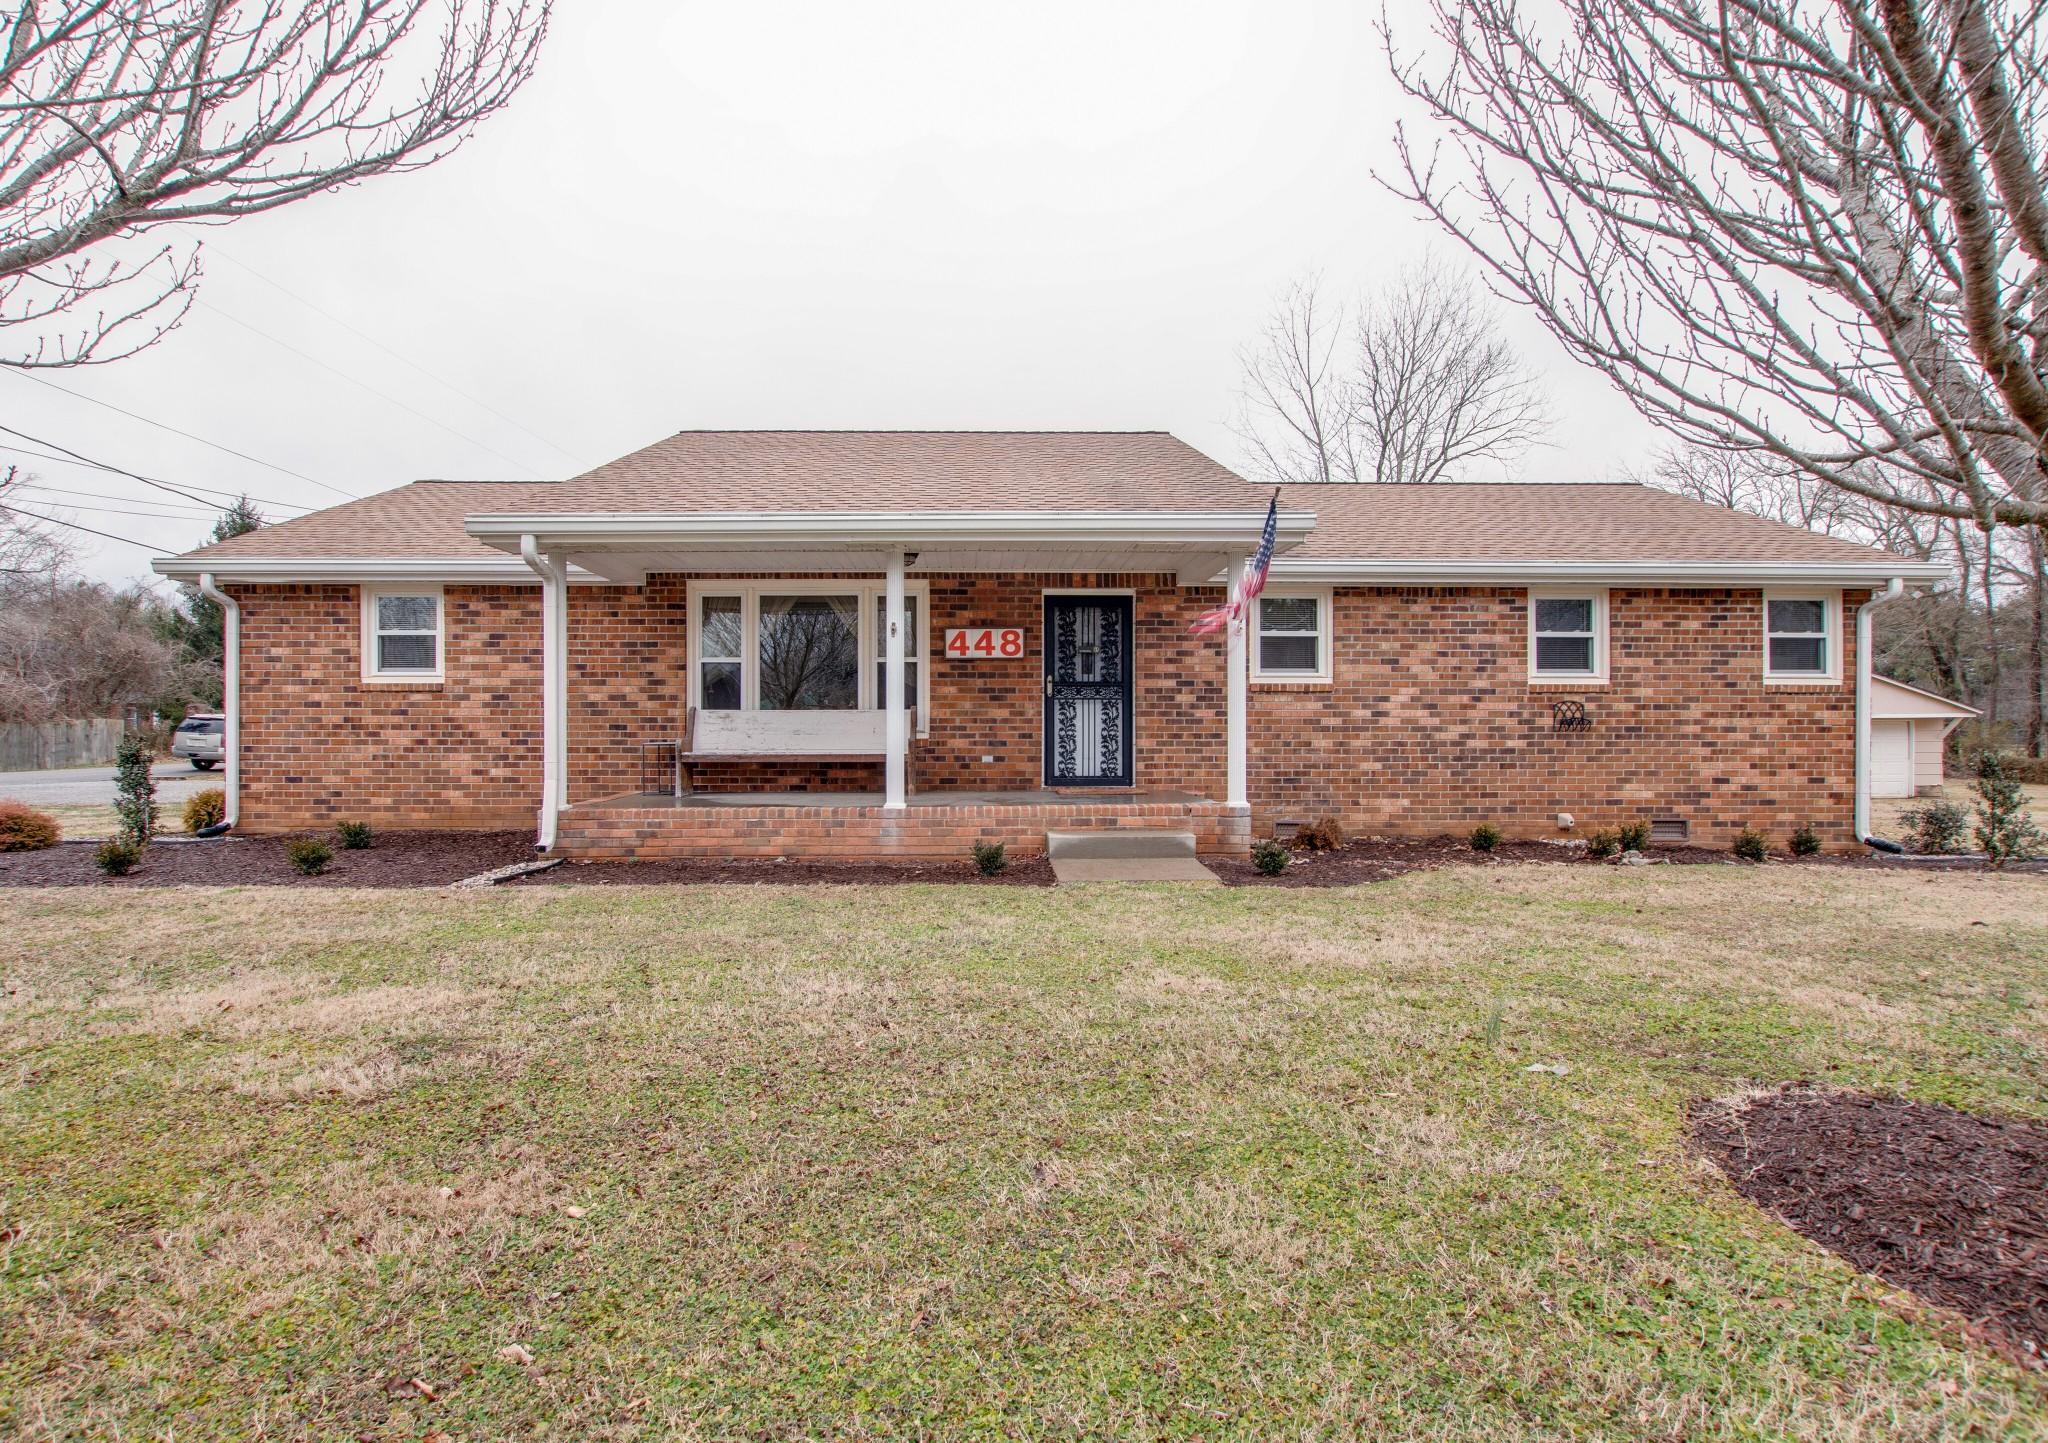 448 Bragg Ave Property Photo - Smyrna, TN real estate listing